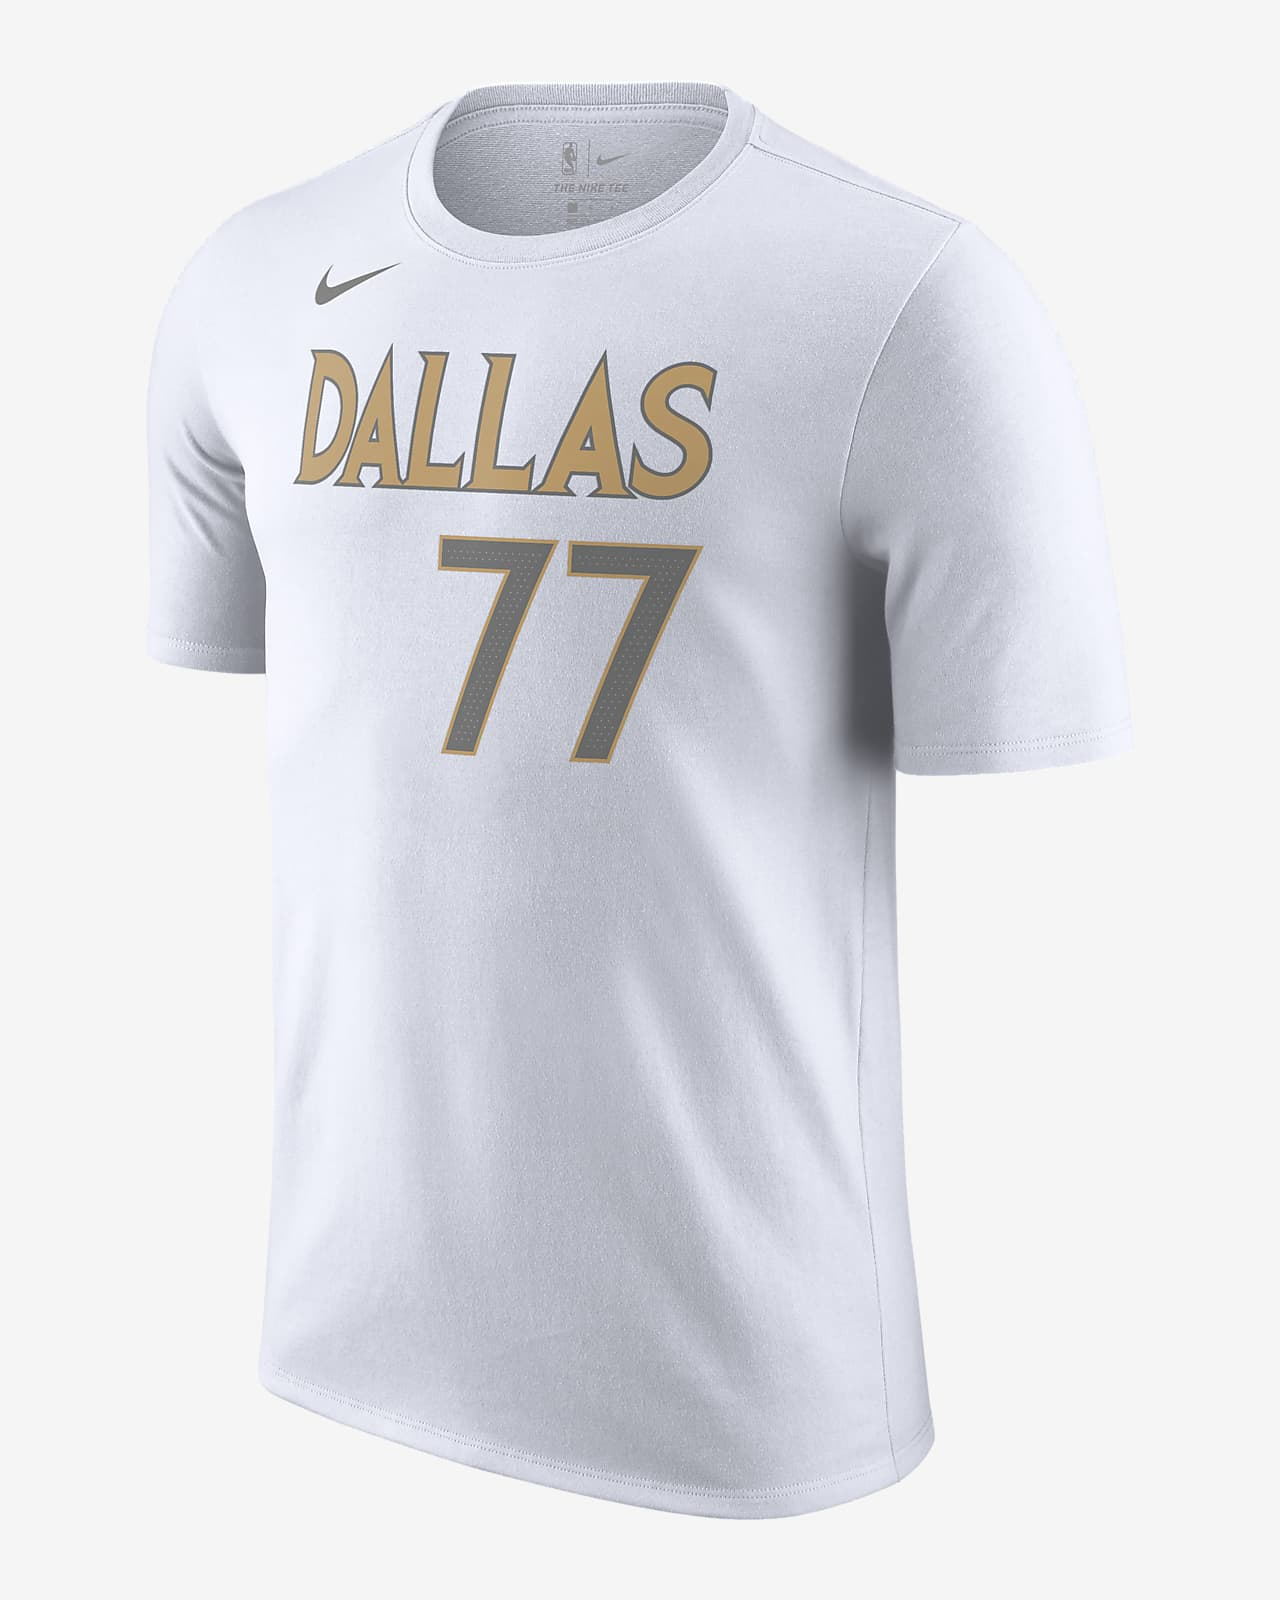 Tee-shirt Nike NBA Dallas Mavericks City Edition pour Homme